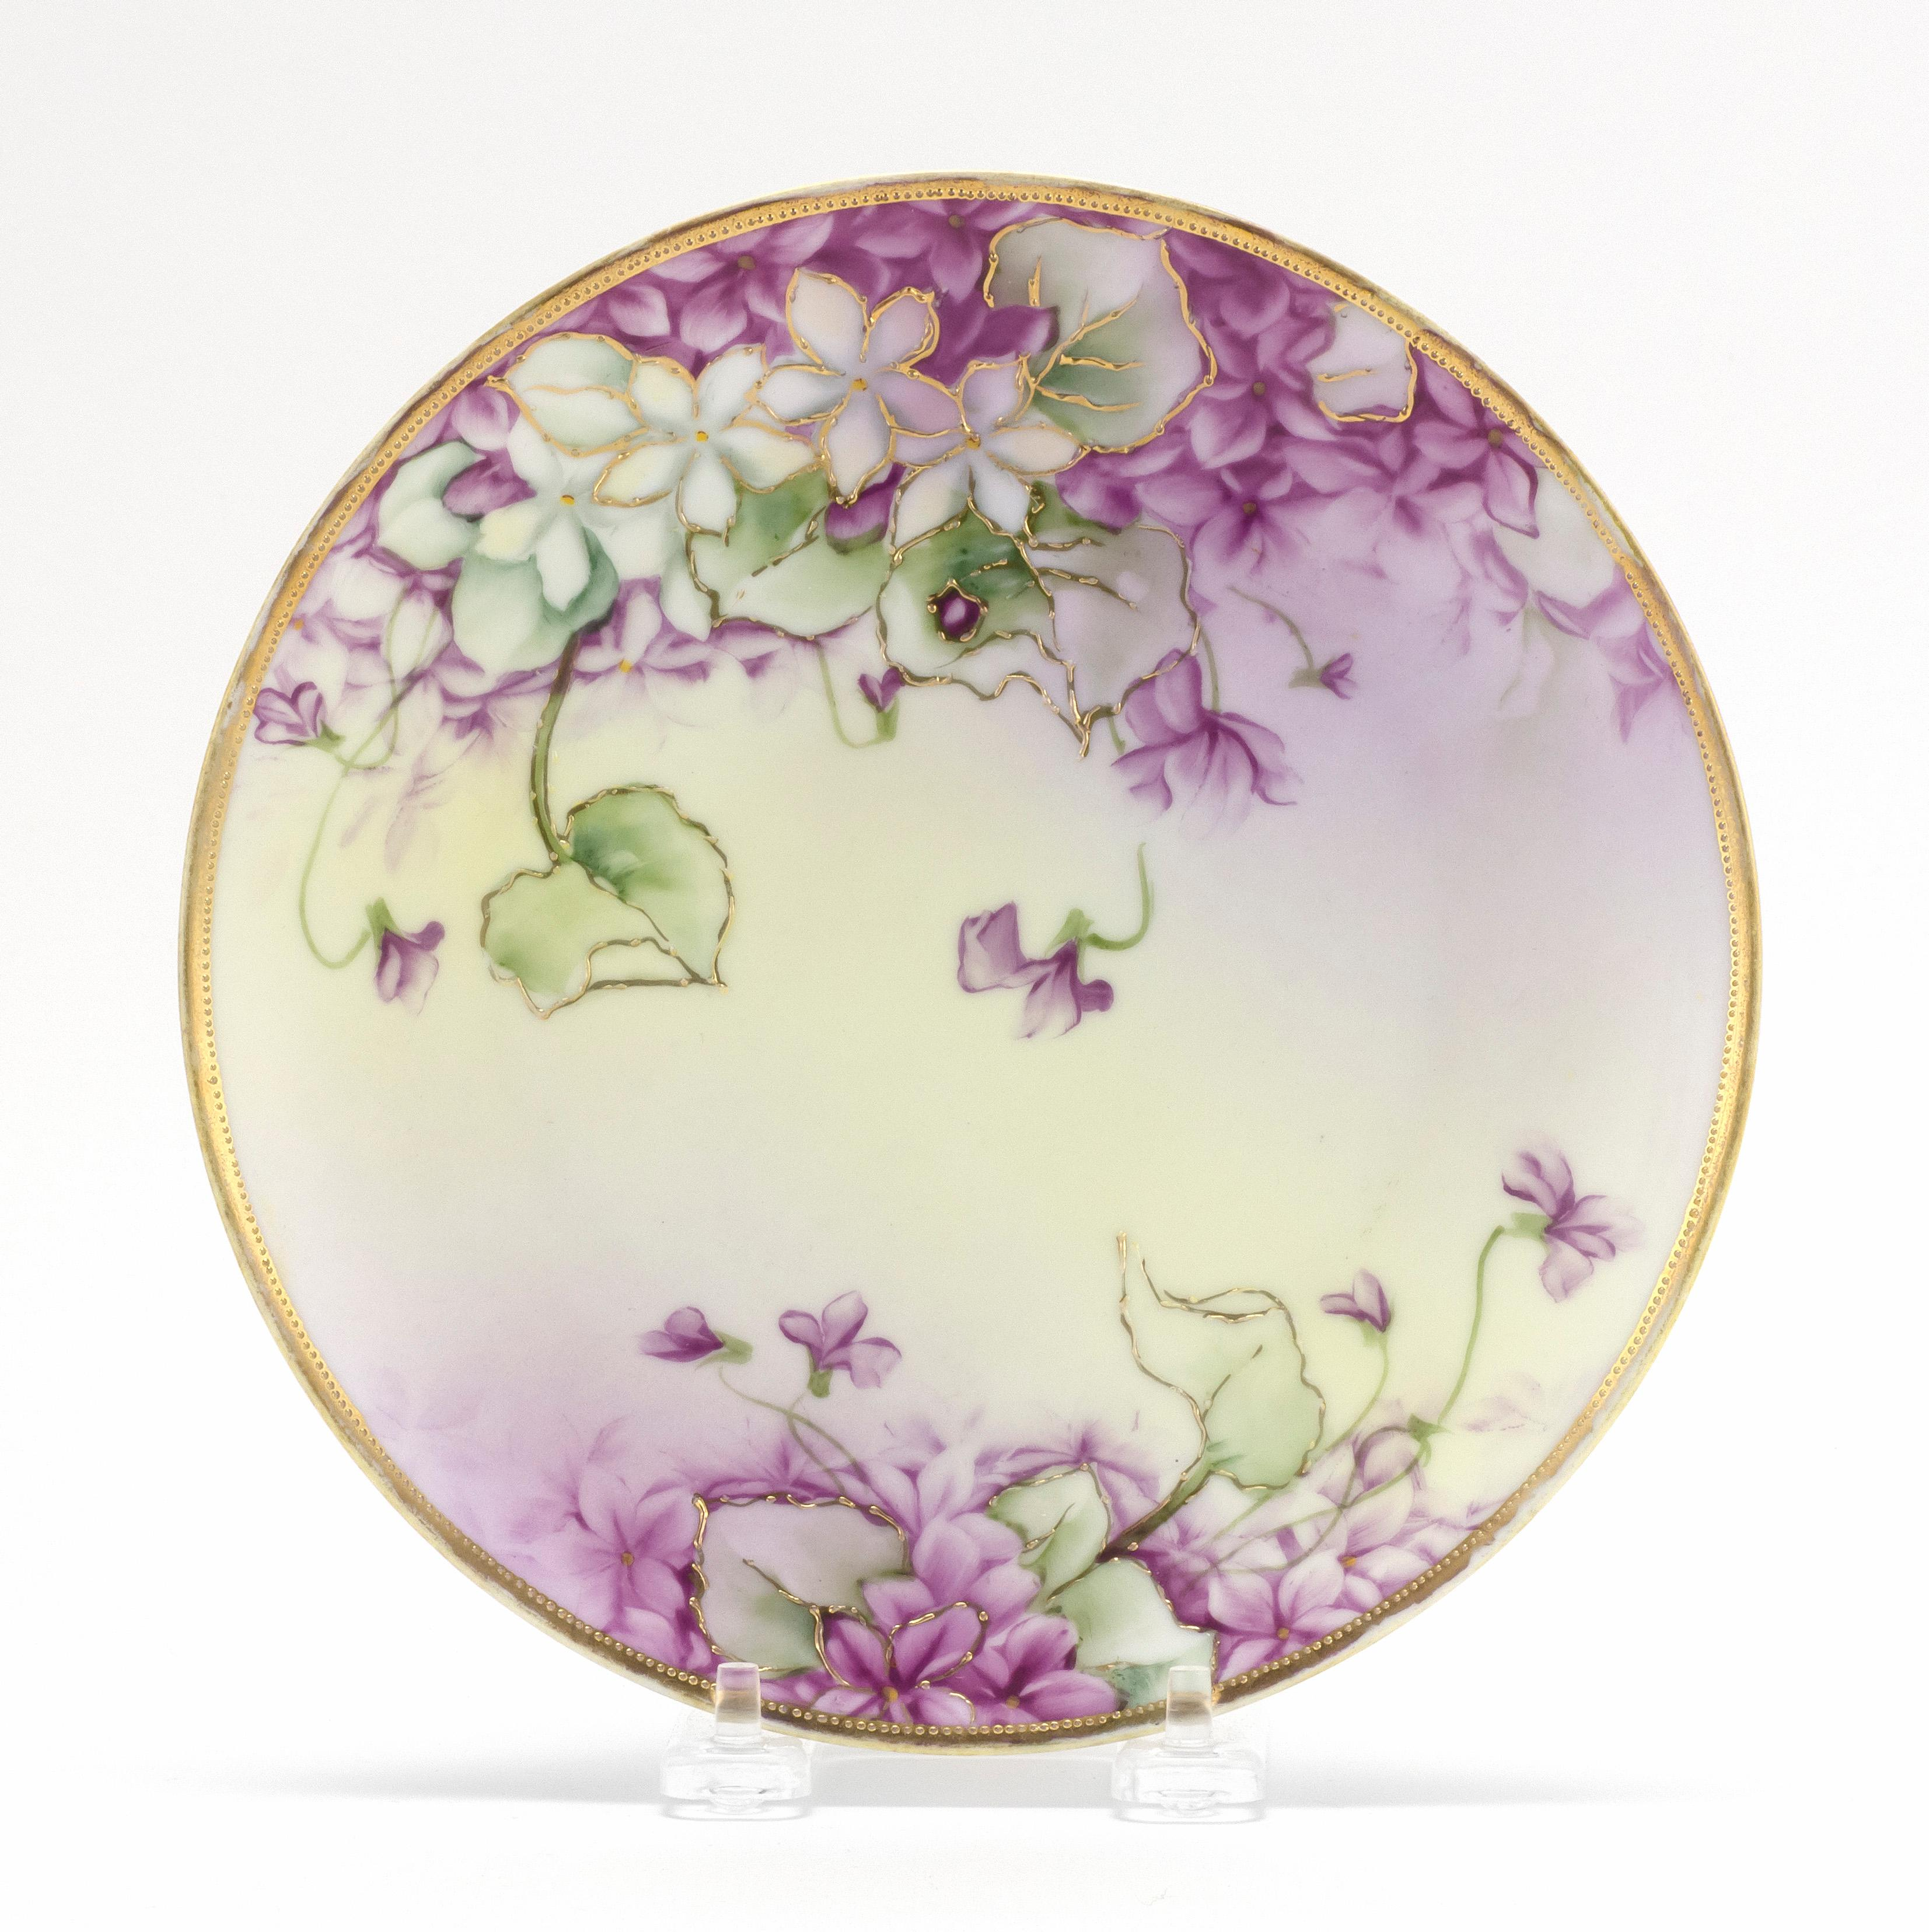 "NIPPON PORCELAIN PLATE With decoration of violets. Van Patten #52 mark on base. Diameter 7.75""."